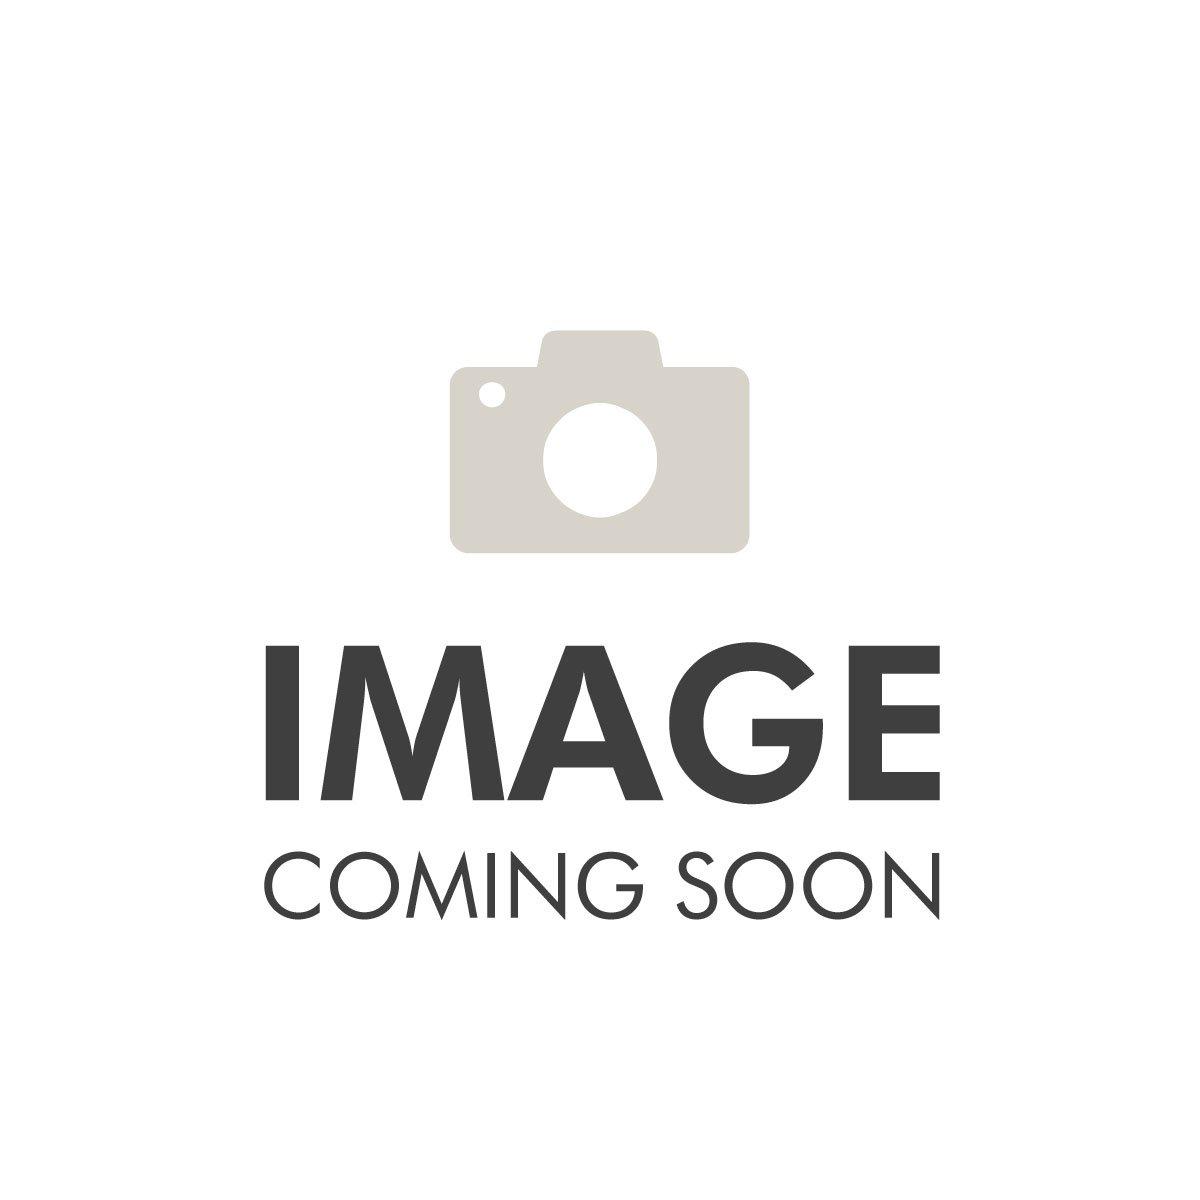 L'Oreal Pure Resource Shampoo 1500ml